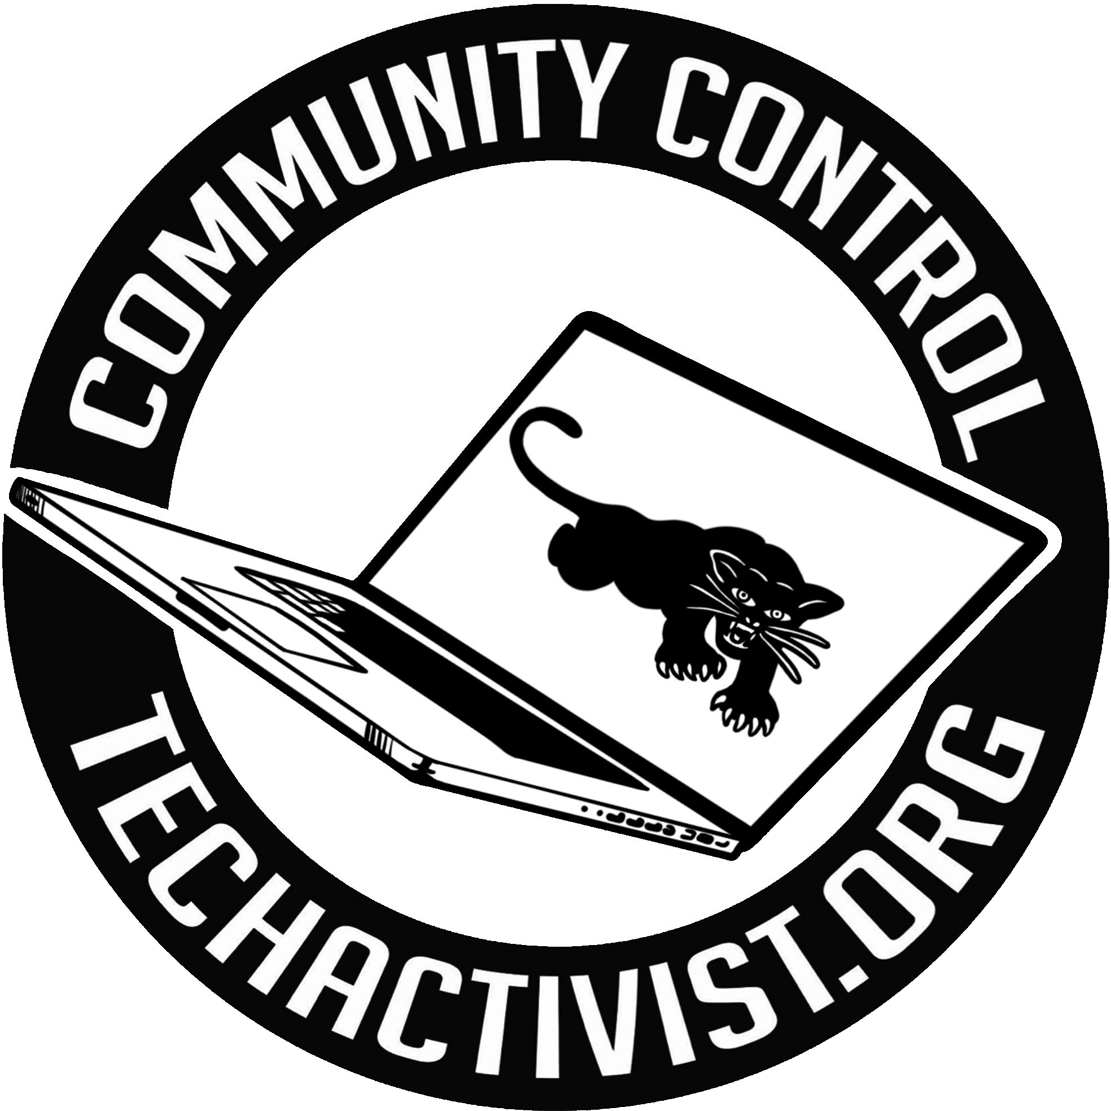 TechActivist.Org